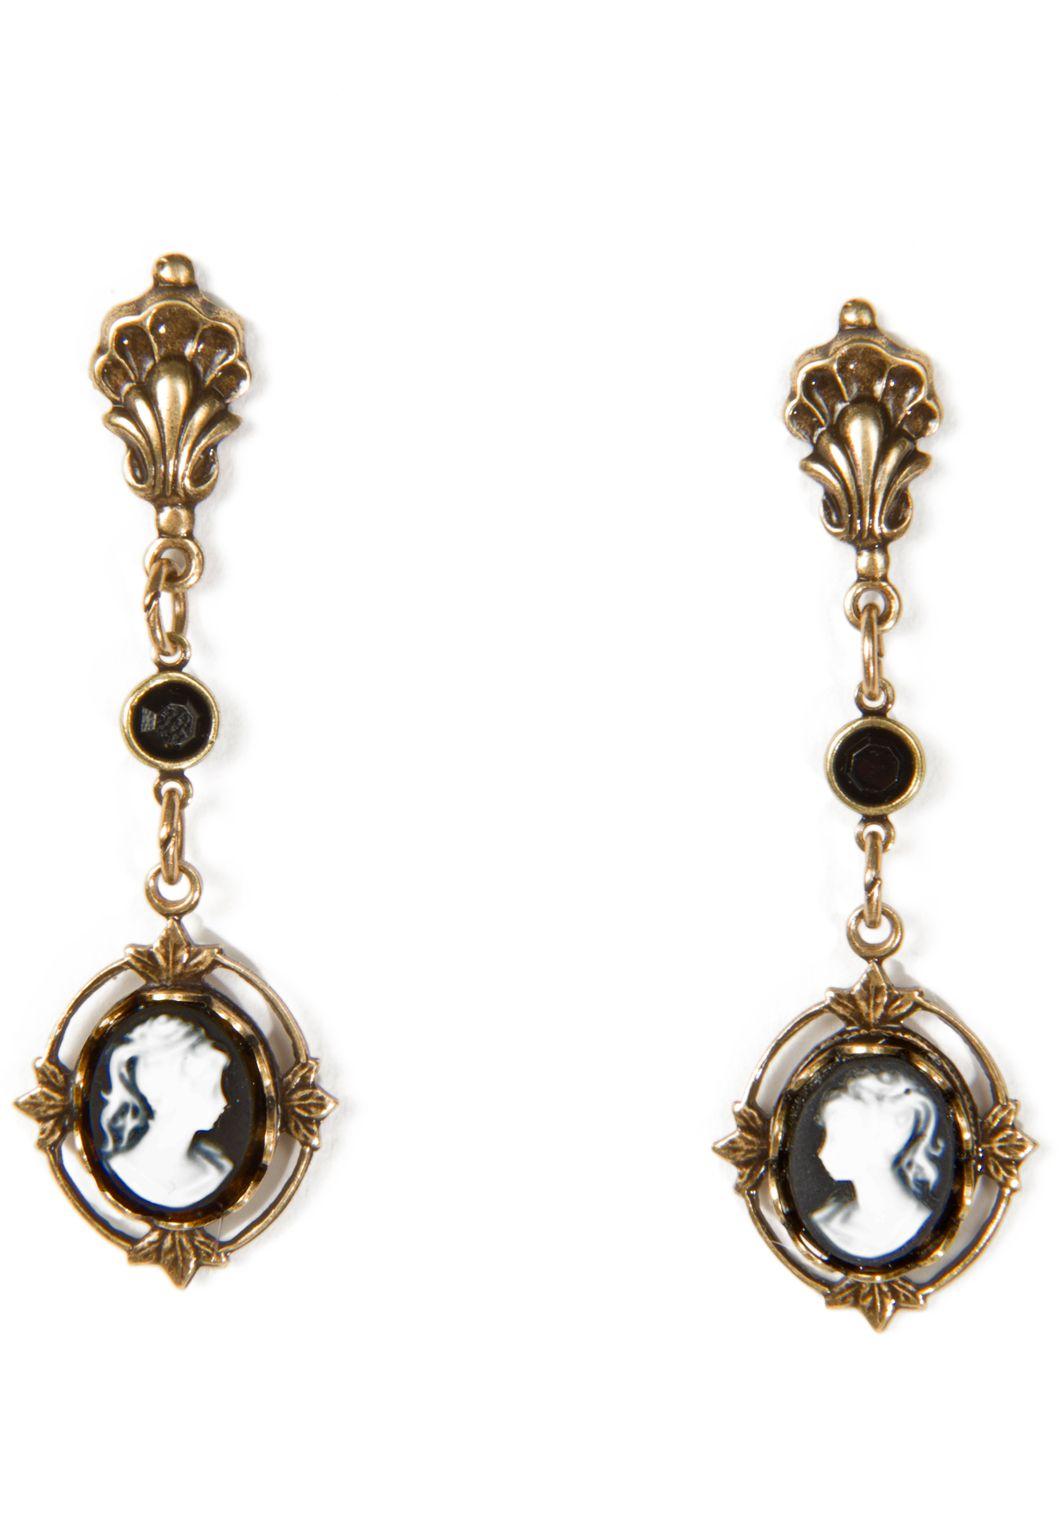 Boho Blue Earrings Victorian Heirloom Design Steampunk Gift